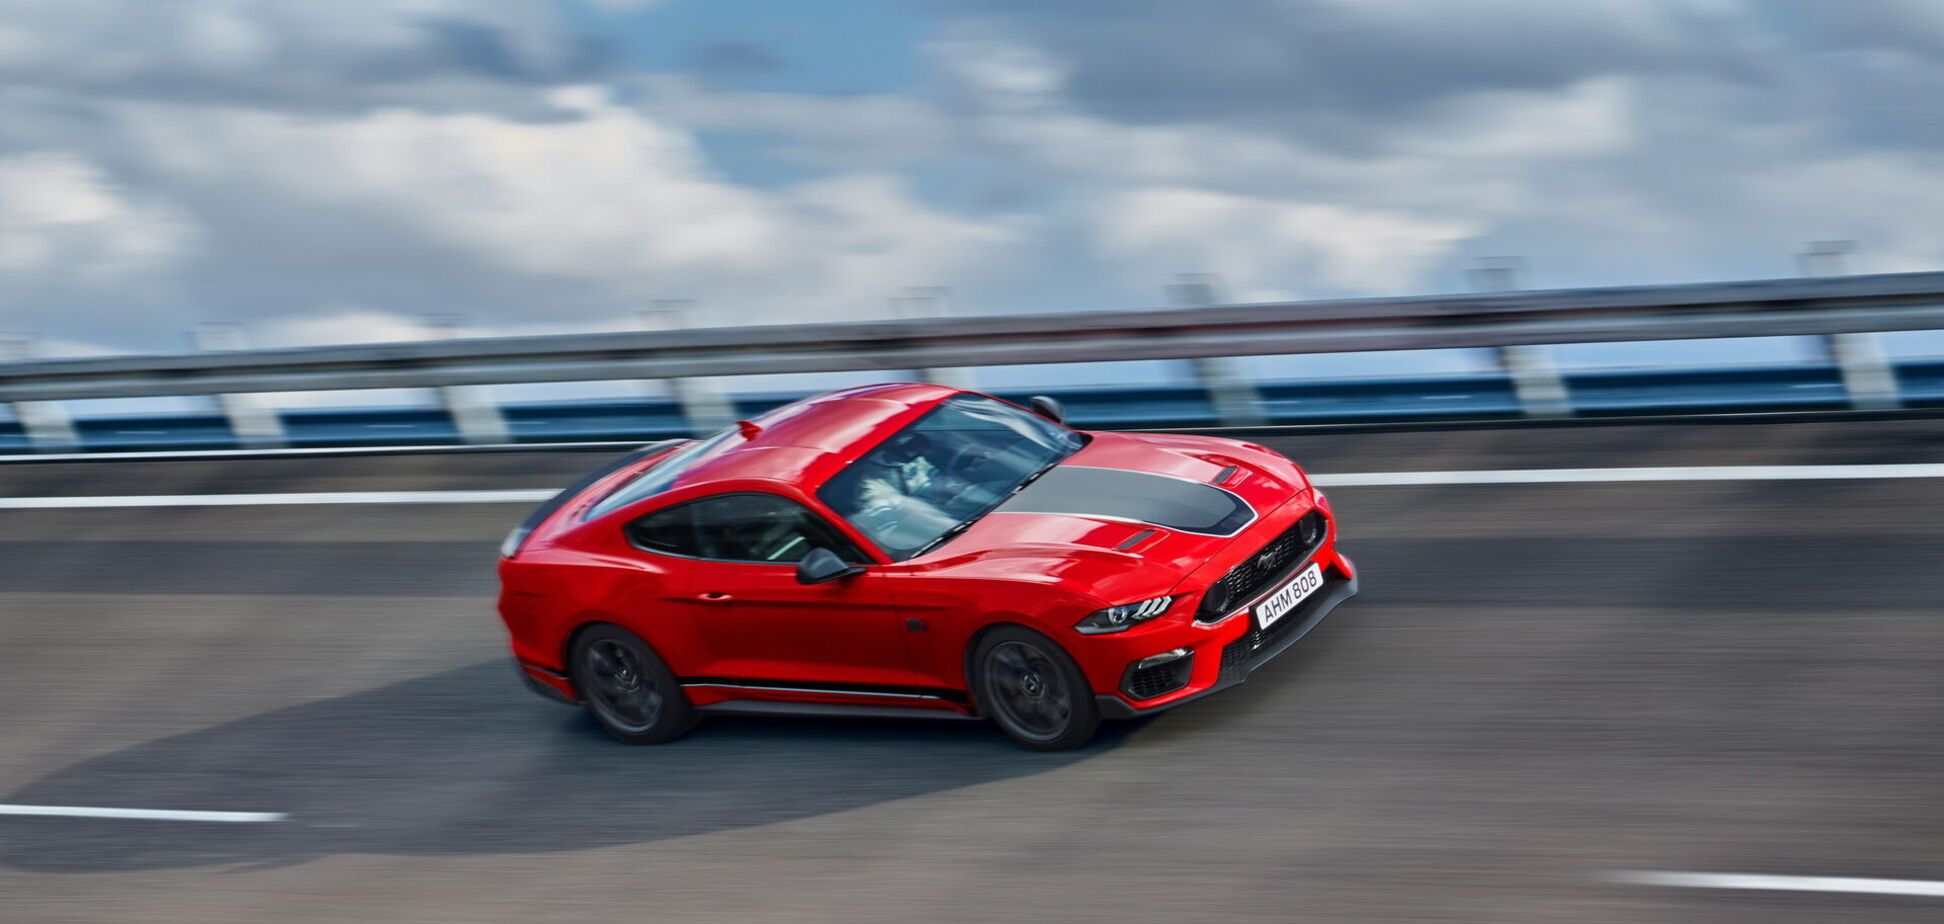 В Европе стартовали продажи самого мощного Ford Mustang